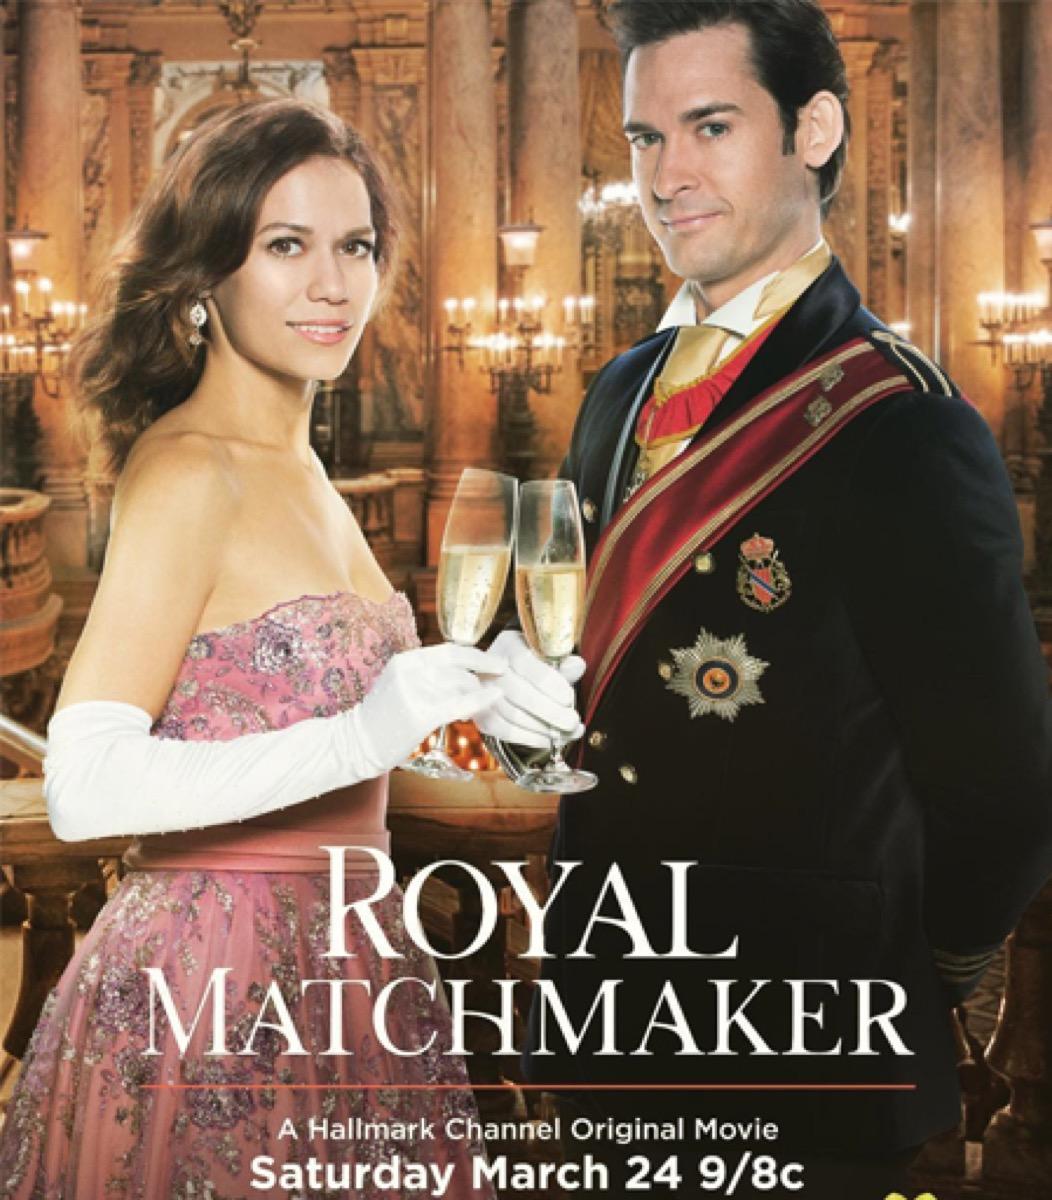 Royal Matchmaker Hallmark movie